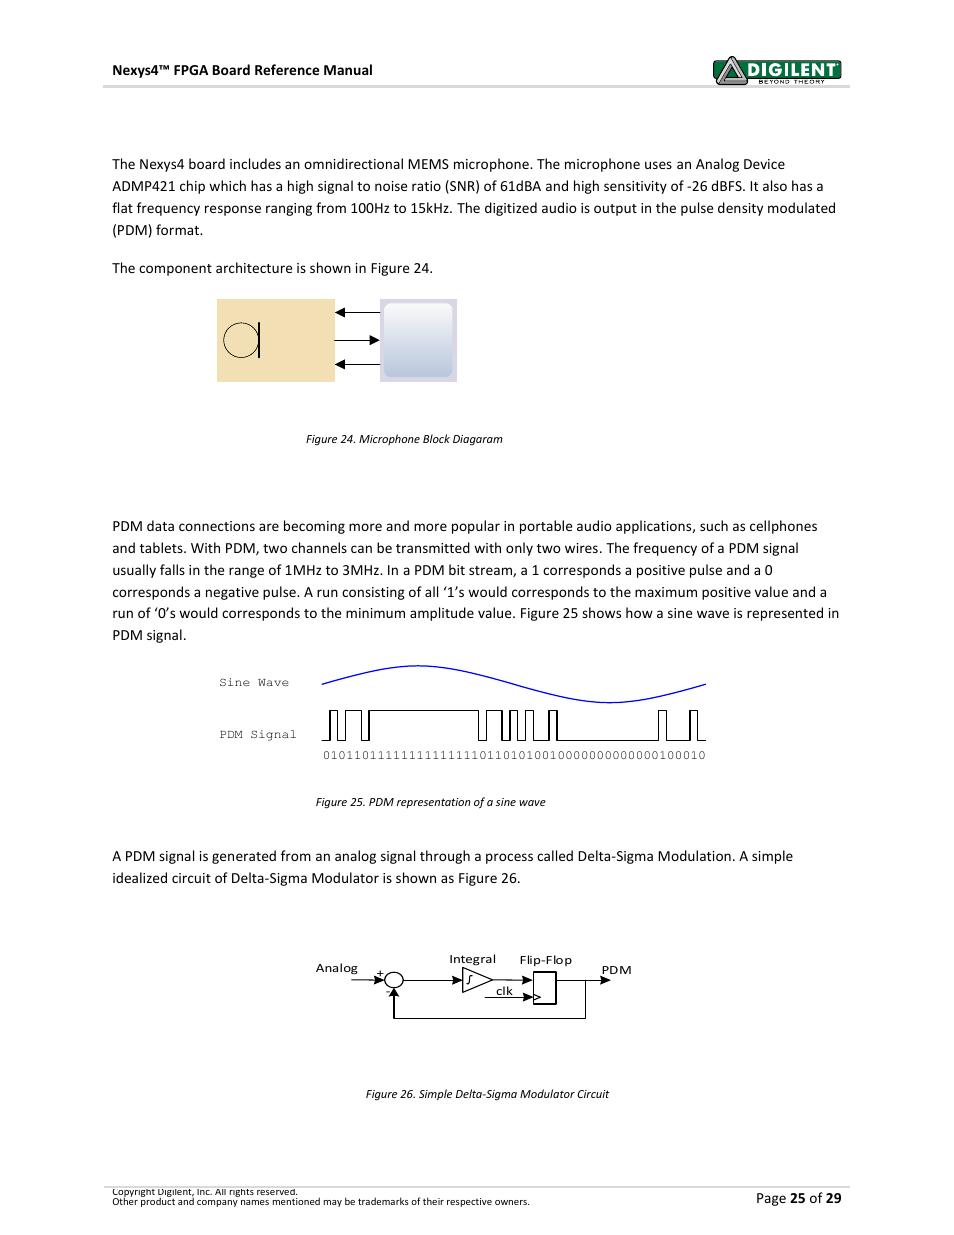 14 microphone, 1 pulse density modulation (pdm) | Digilent